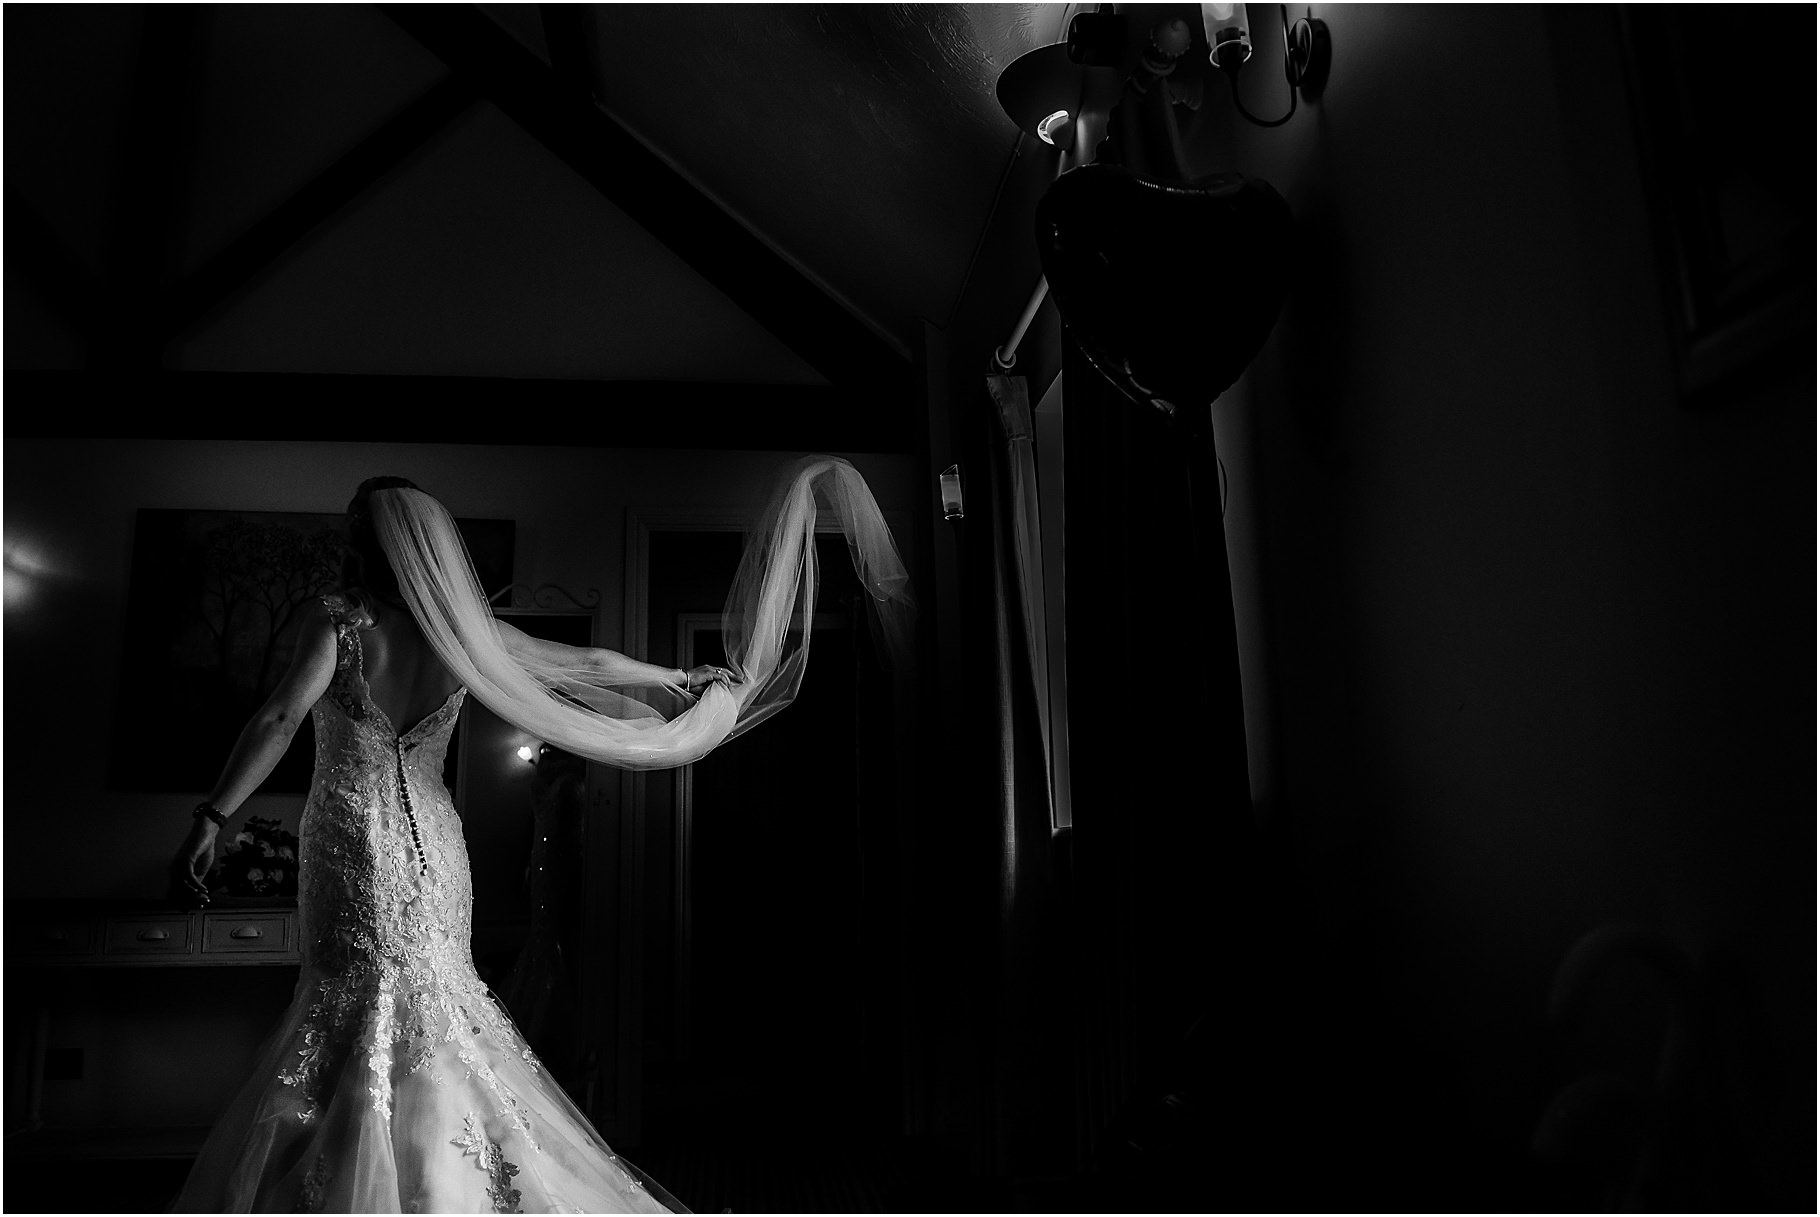 dan-wootton-photography-2017-weddings-078.jpg